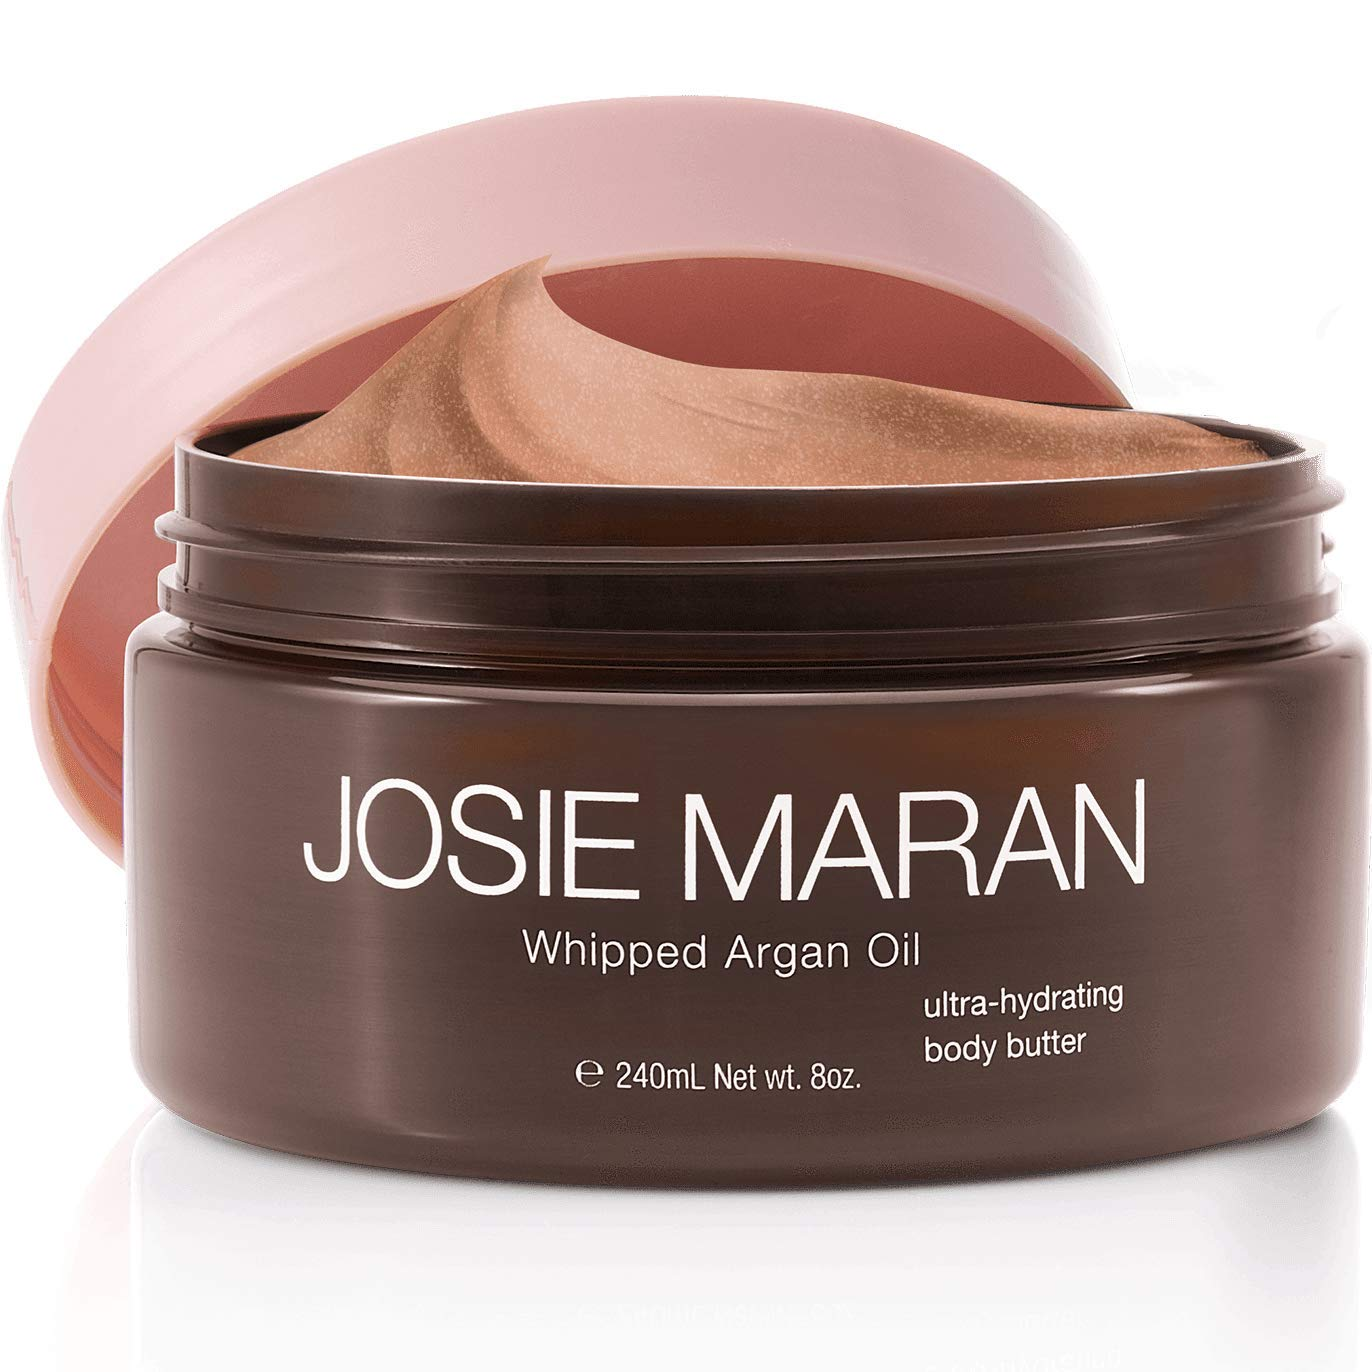 Josie Maran Whipped Argan Oil Illuminizing Body Butter - Restores Skin Softness and Improves Skin Texture - Light Bronze Shimmer (240ml/8oz, Vanilla Peach)